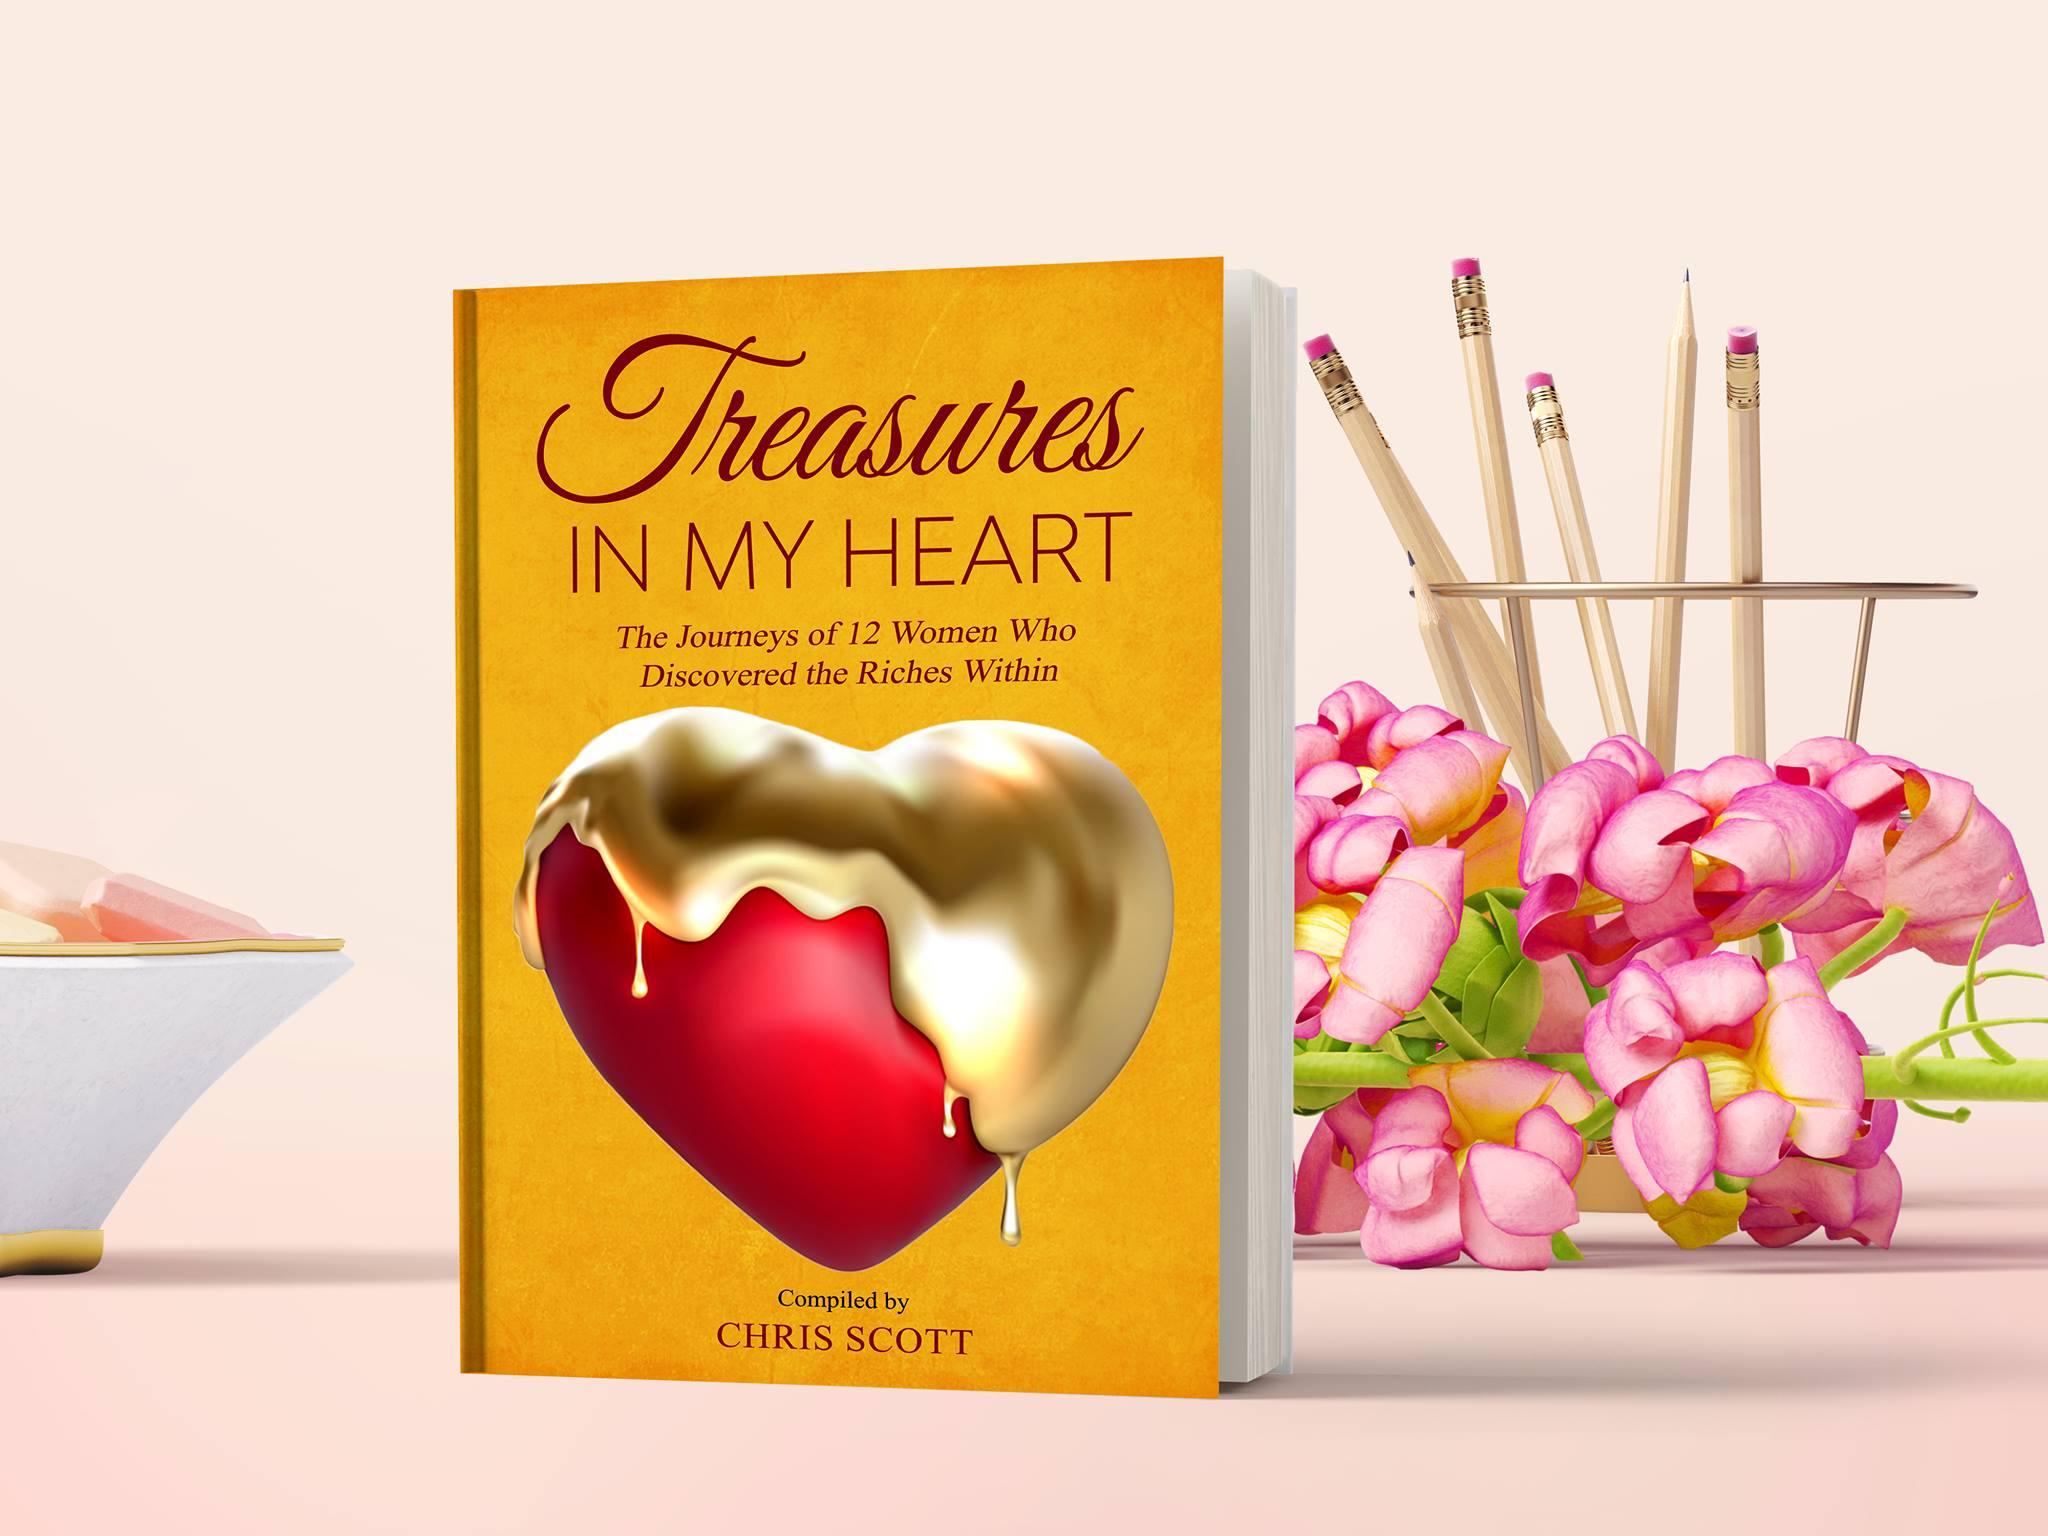 TreasuresOftheheartbookcover